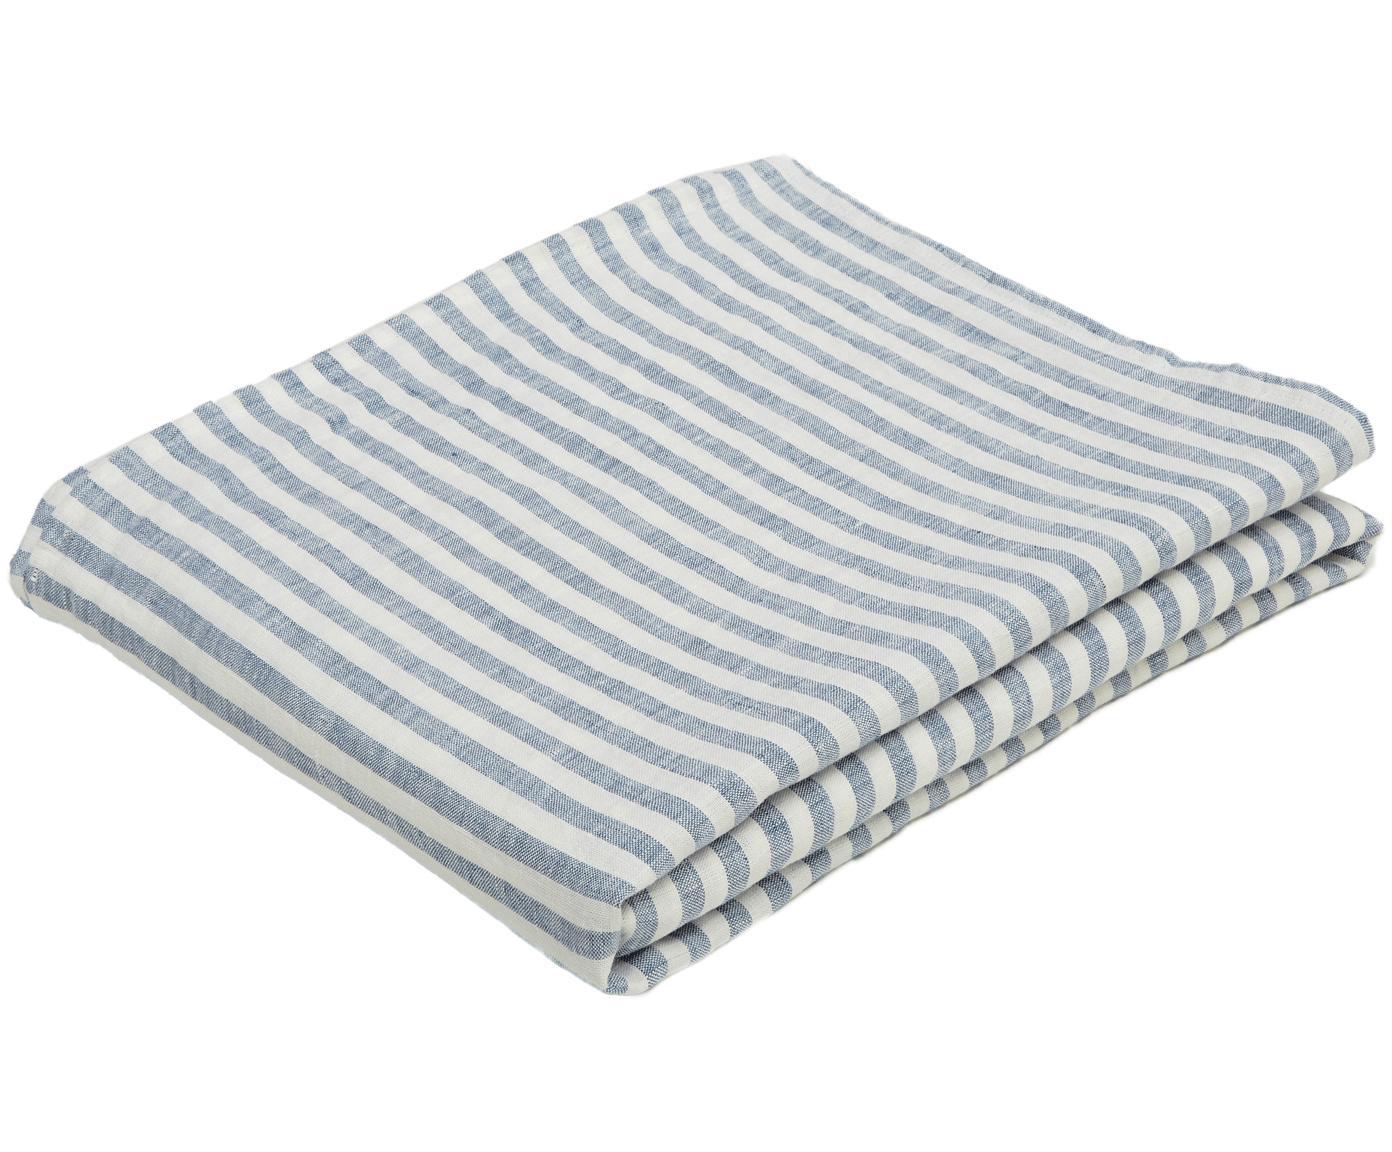 Linnen tafellaken Solami, Linnen, Lichtblauw, wit, Voor 6 - 8 personen (B 150 x L 250 cm)